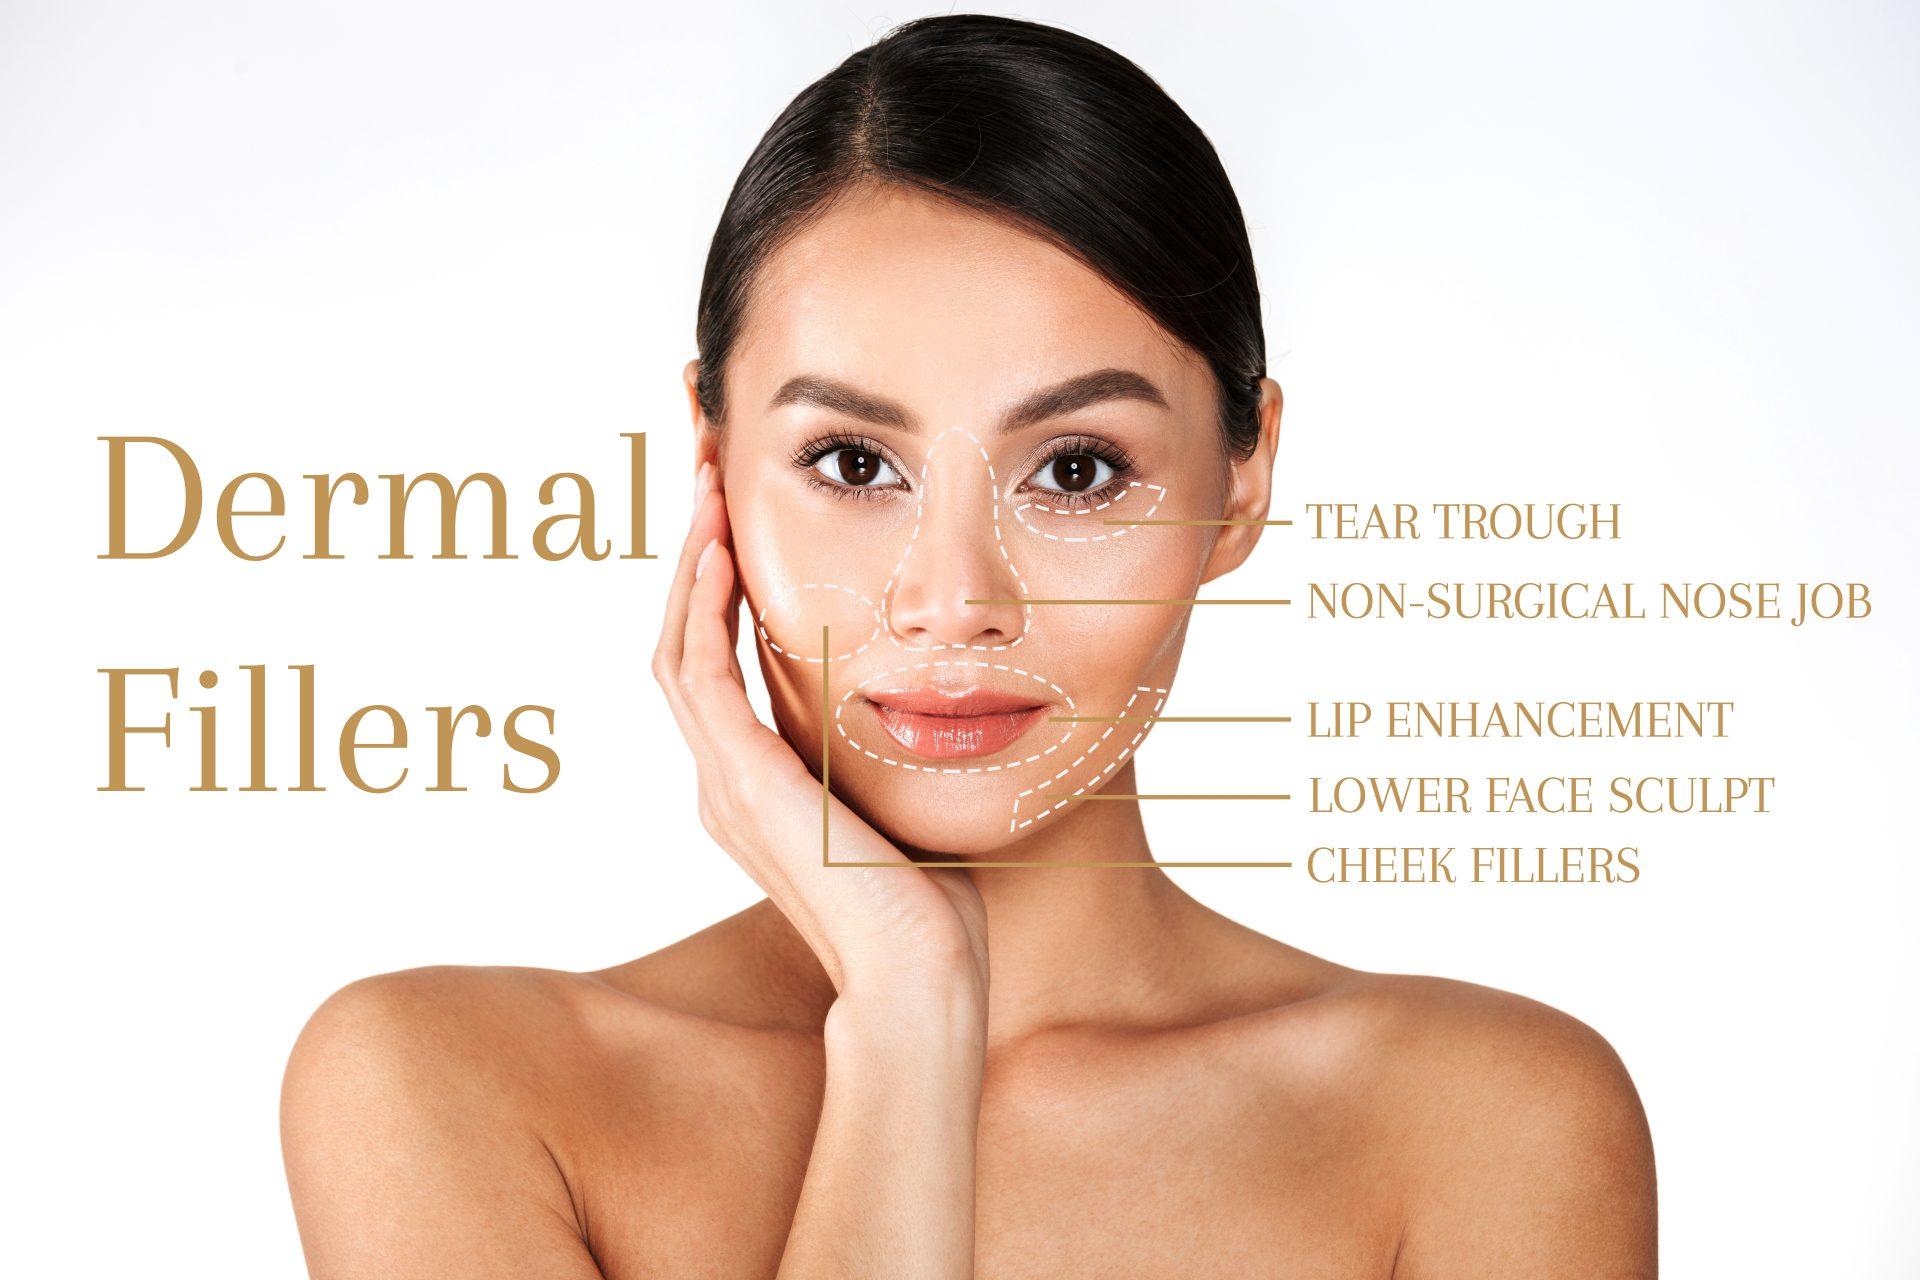 The Longevity of Dermal Fillers